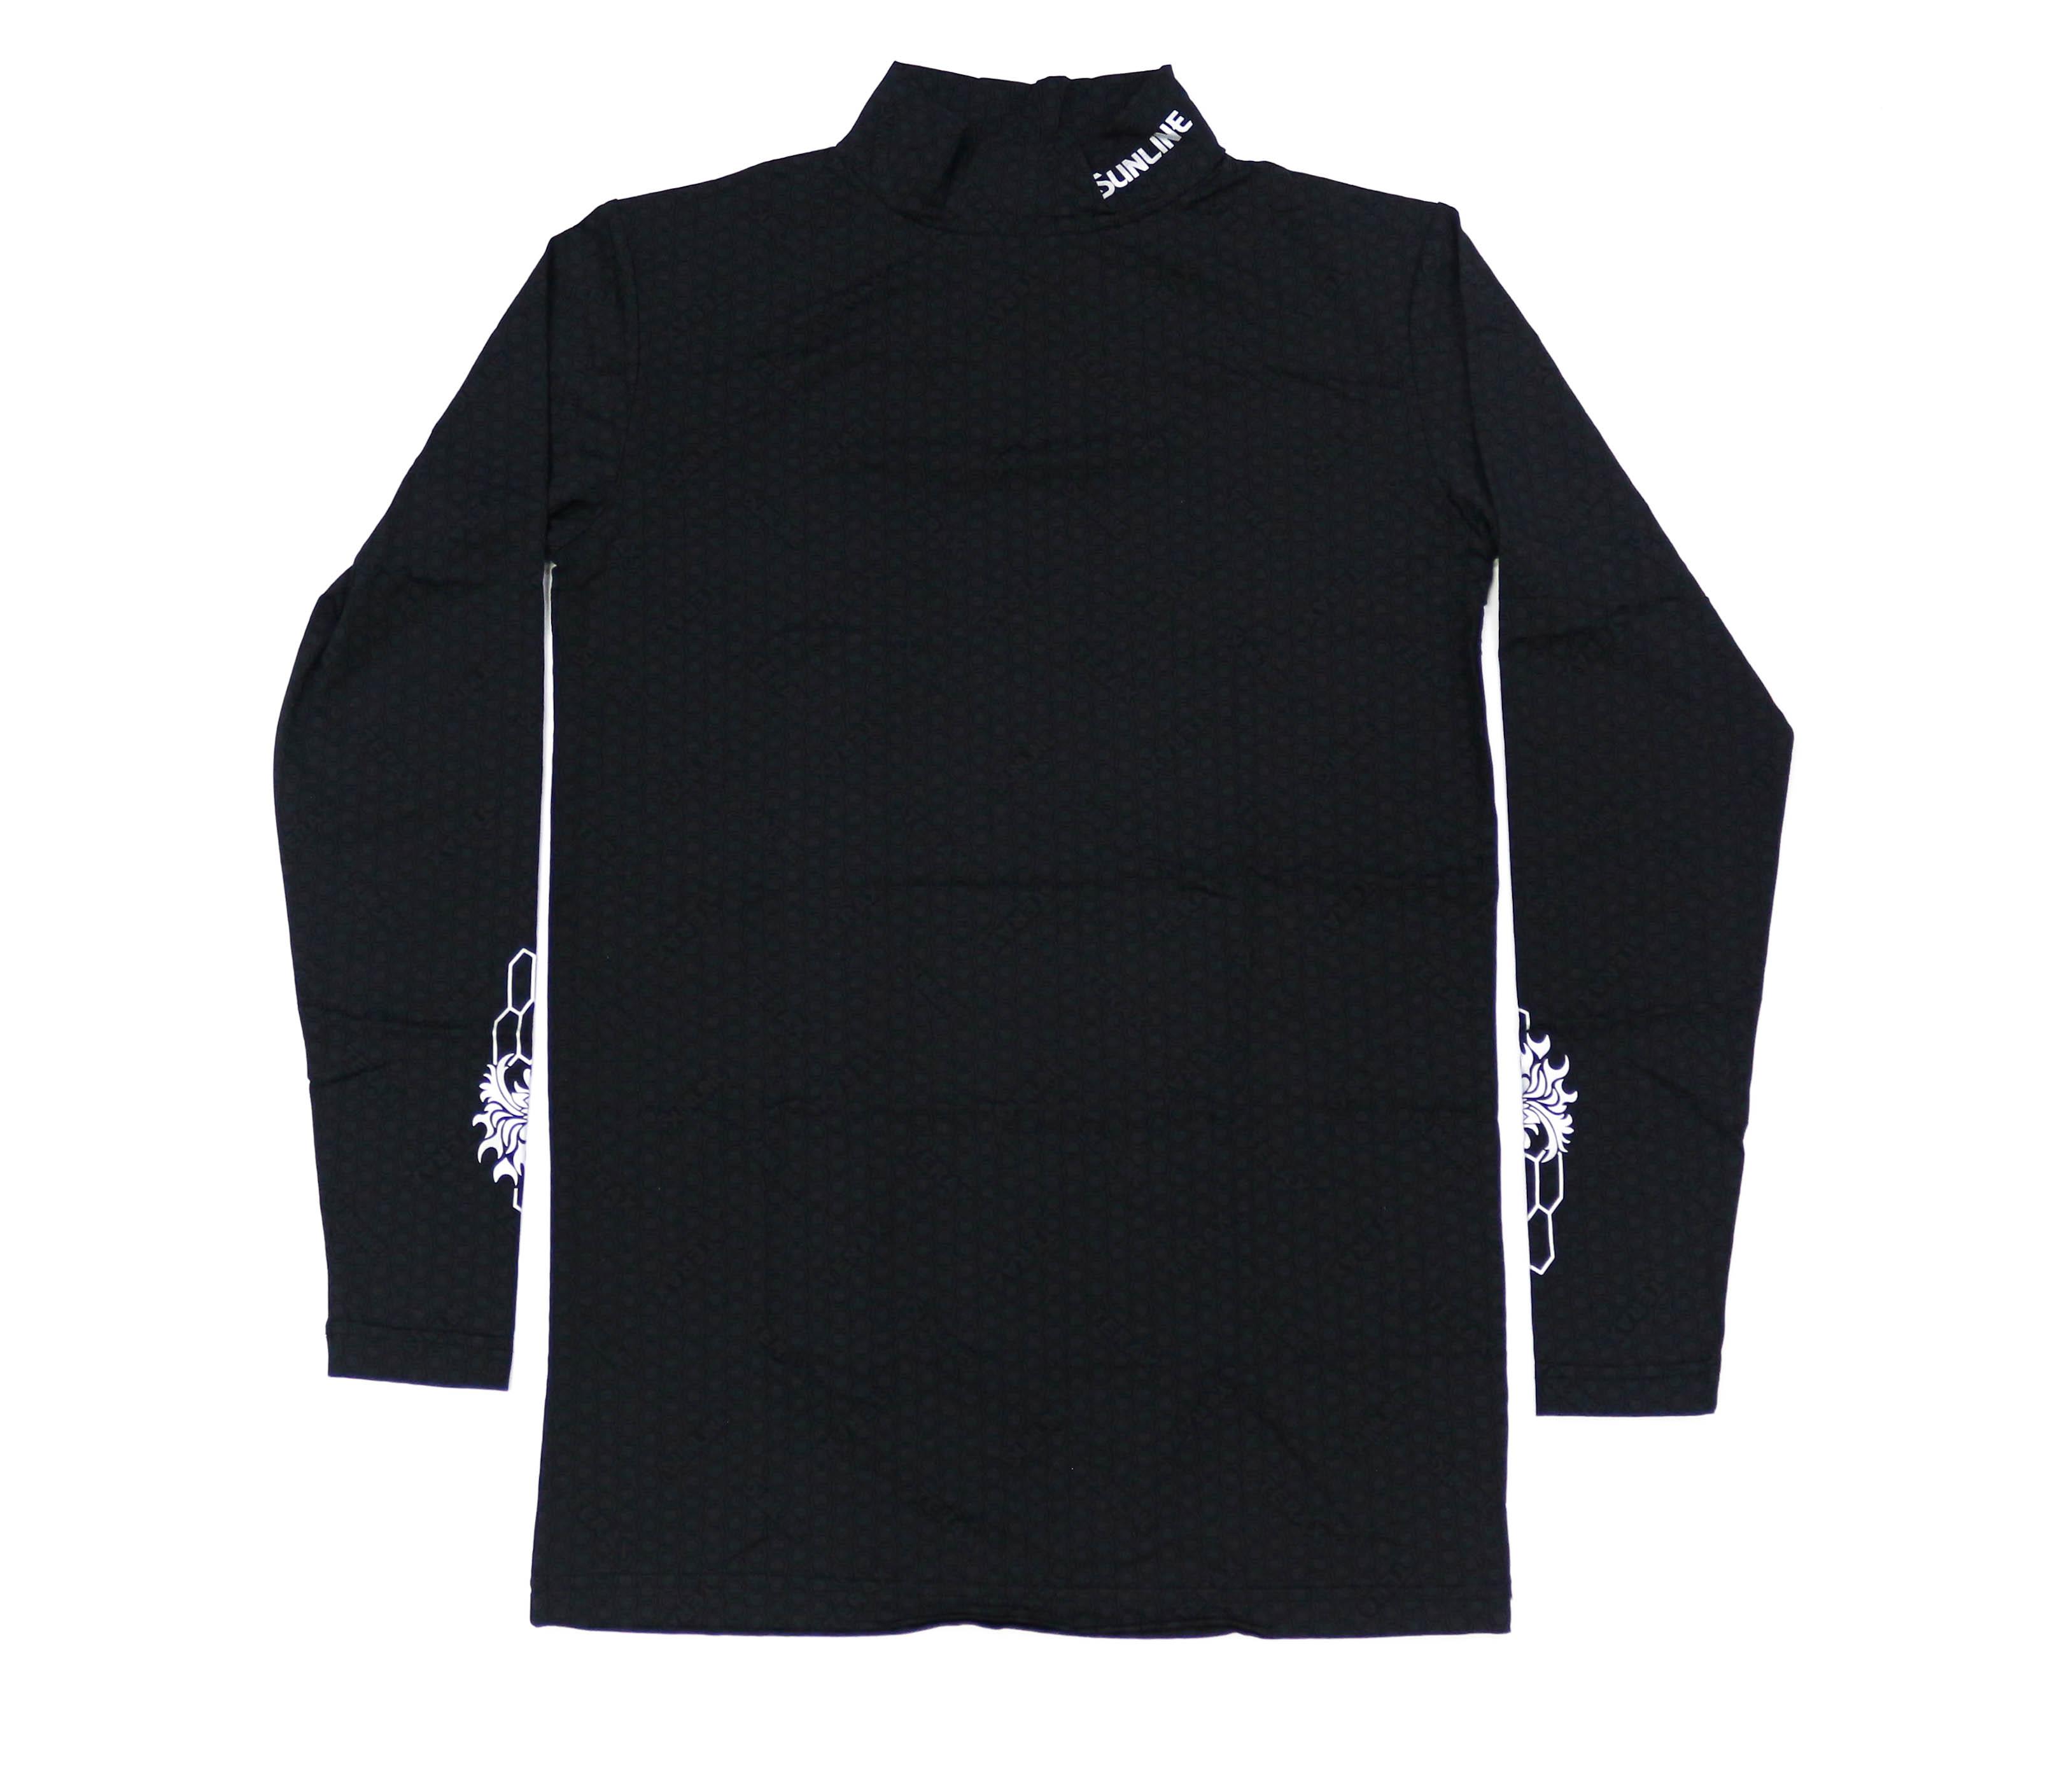 Sunline SUW-5535CW Undershirt Terax Cool Black Size M (2419)